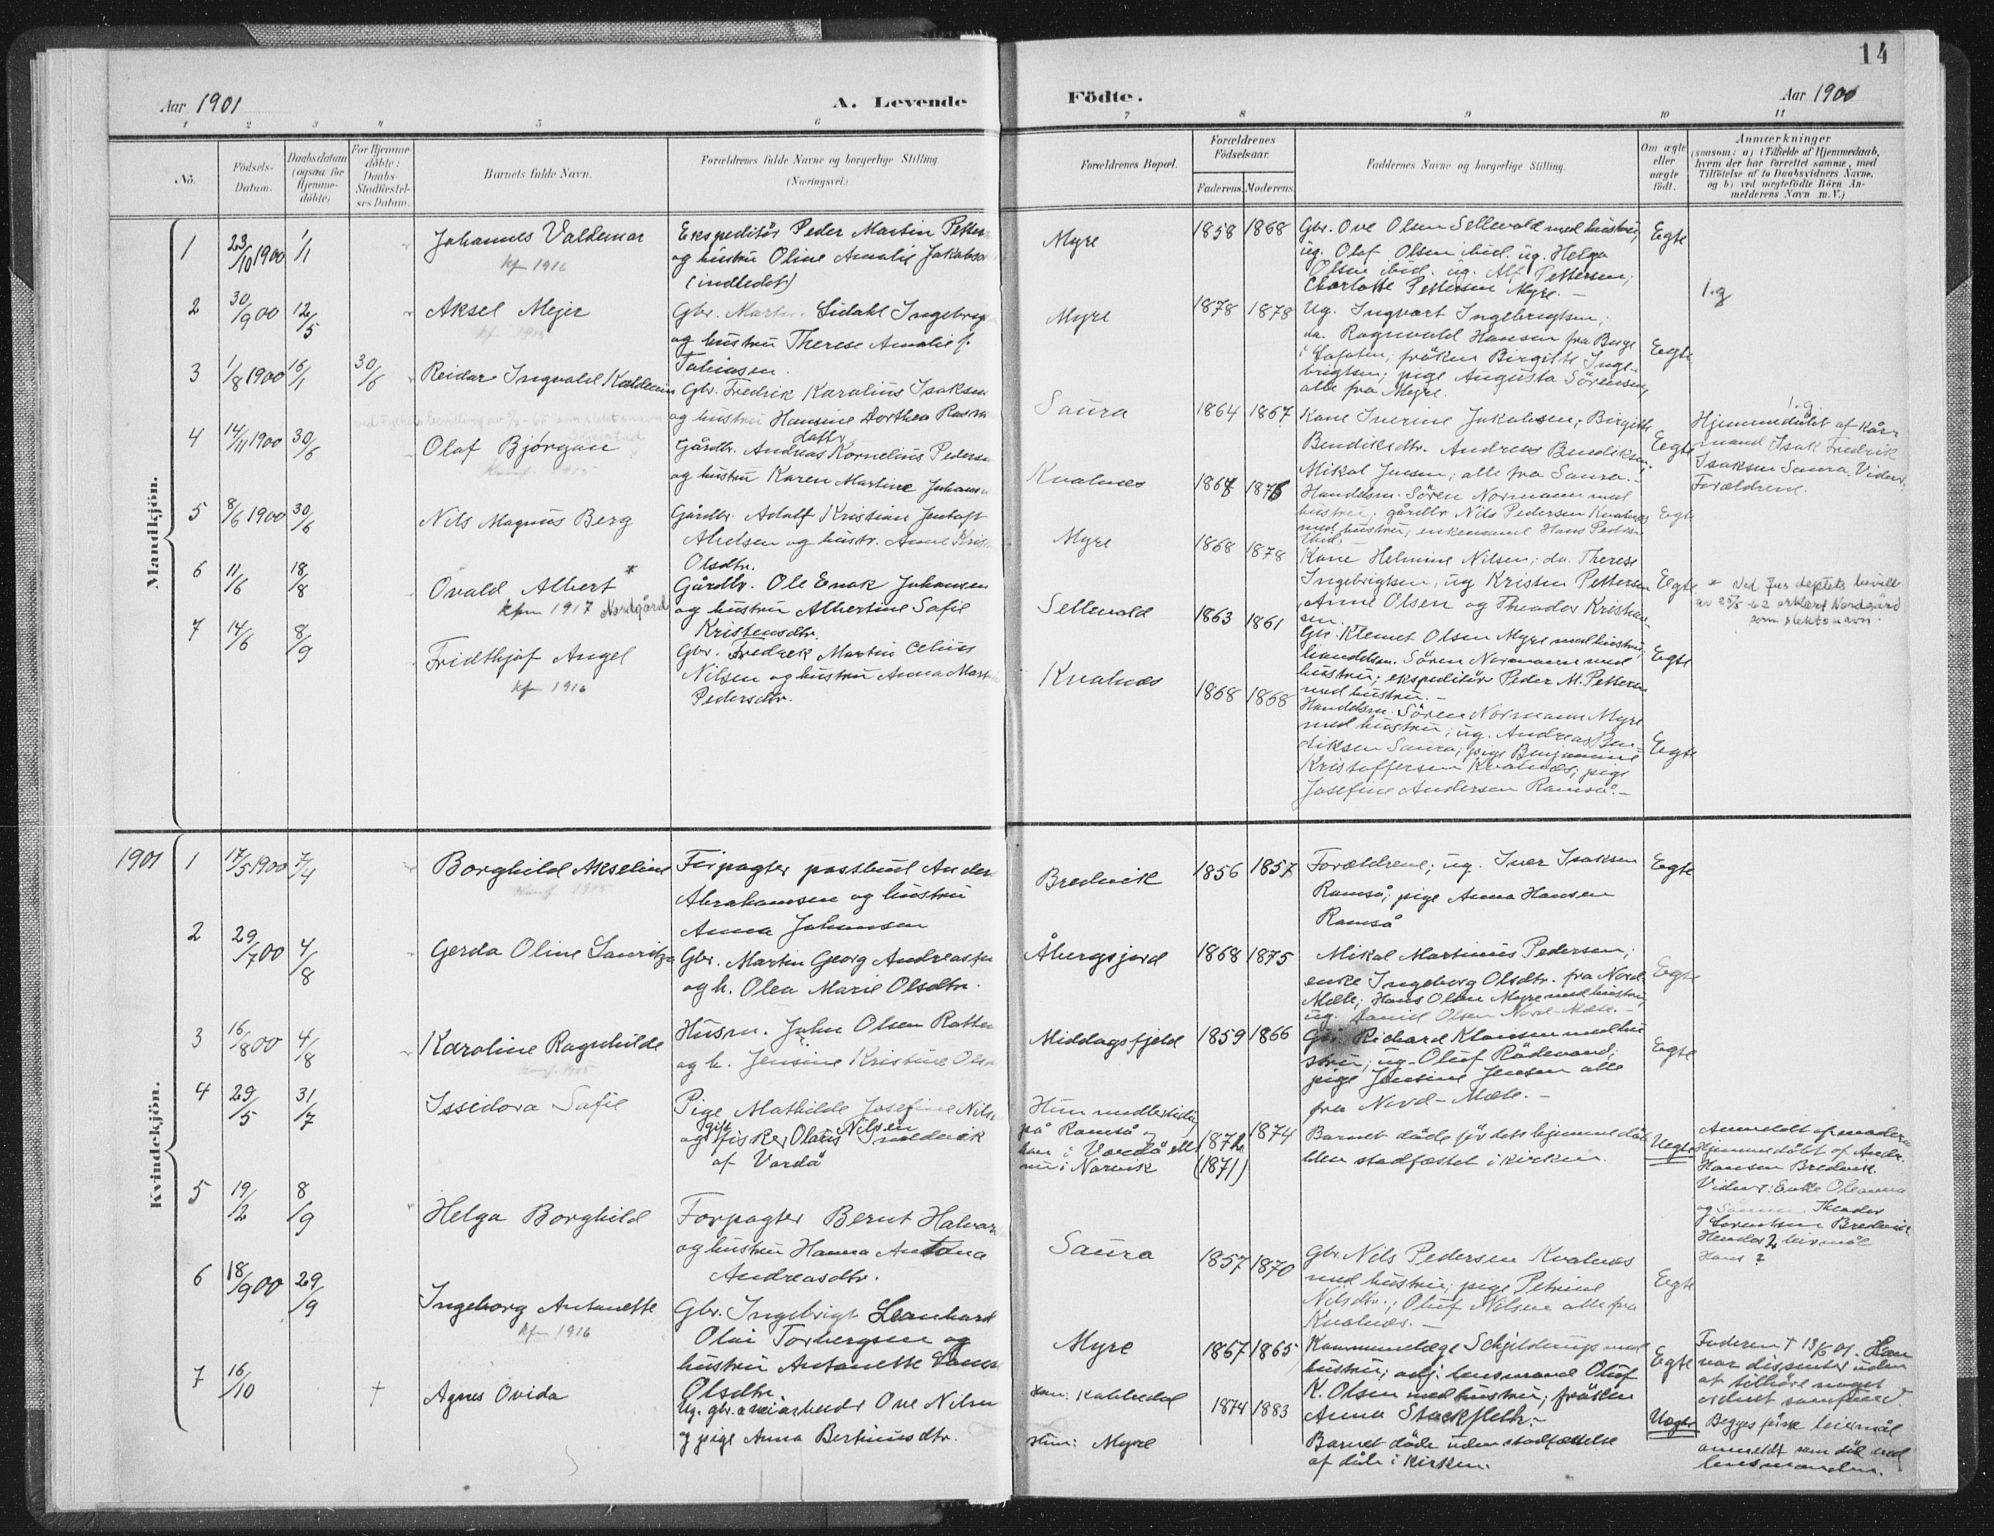 SAT, Ministerialprotokoller, klokkerbøker og fødselsregistre - Nordland, 897/L1400: Ministerialbok nr. 897A07, 1897-1908, s. 14